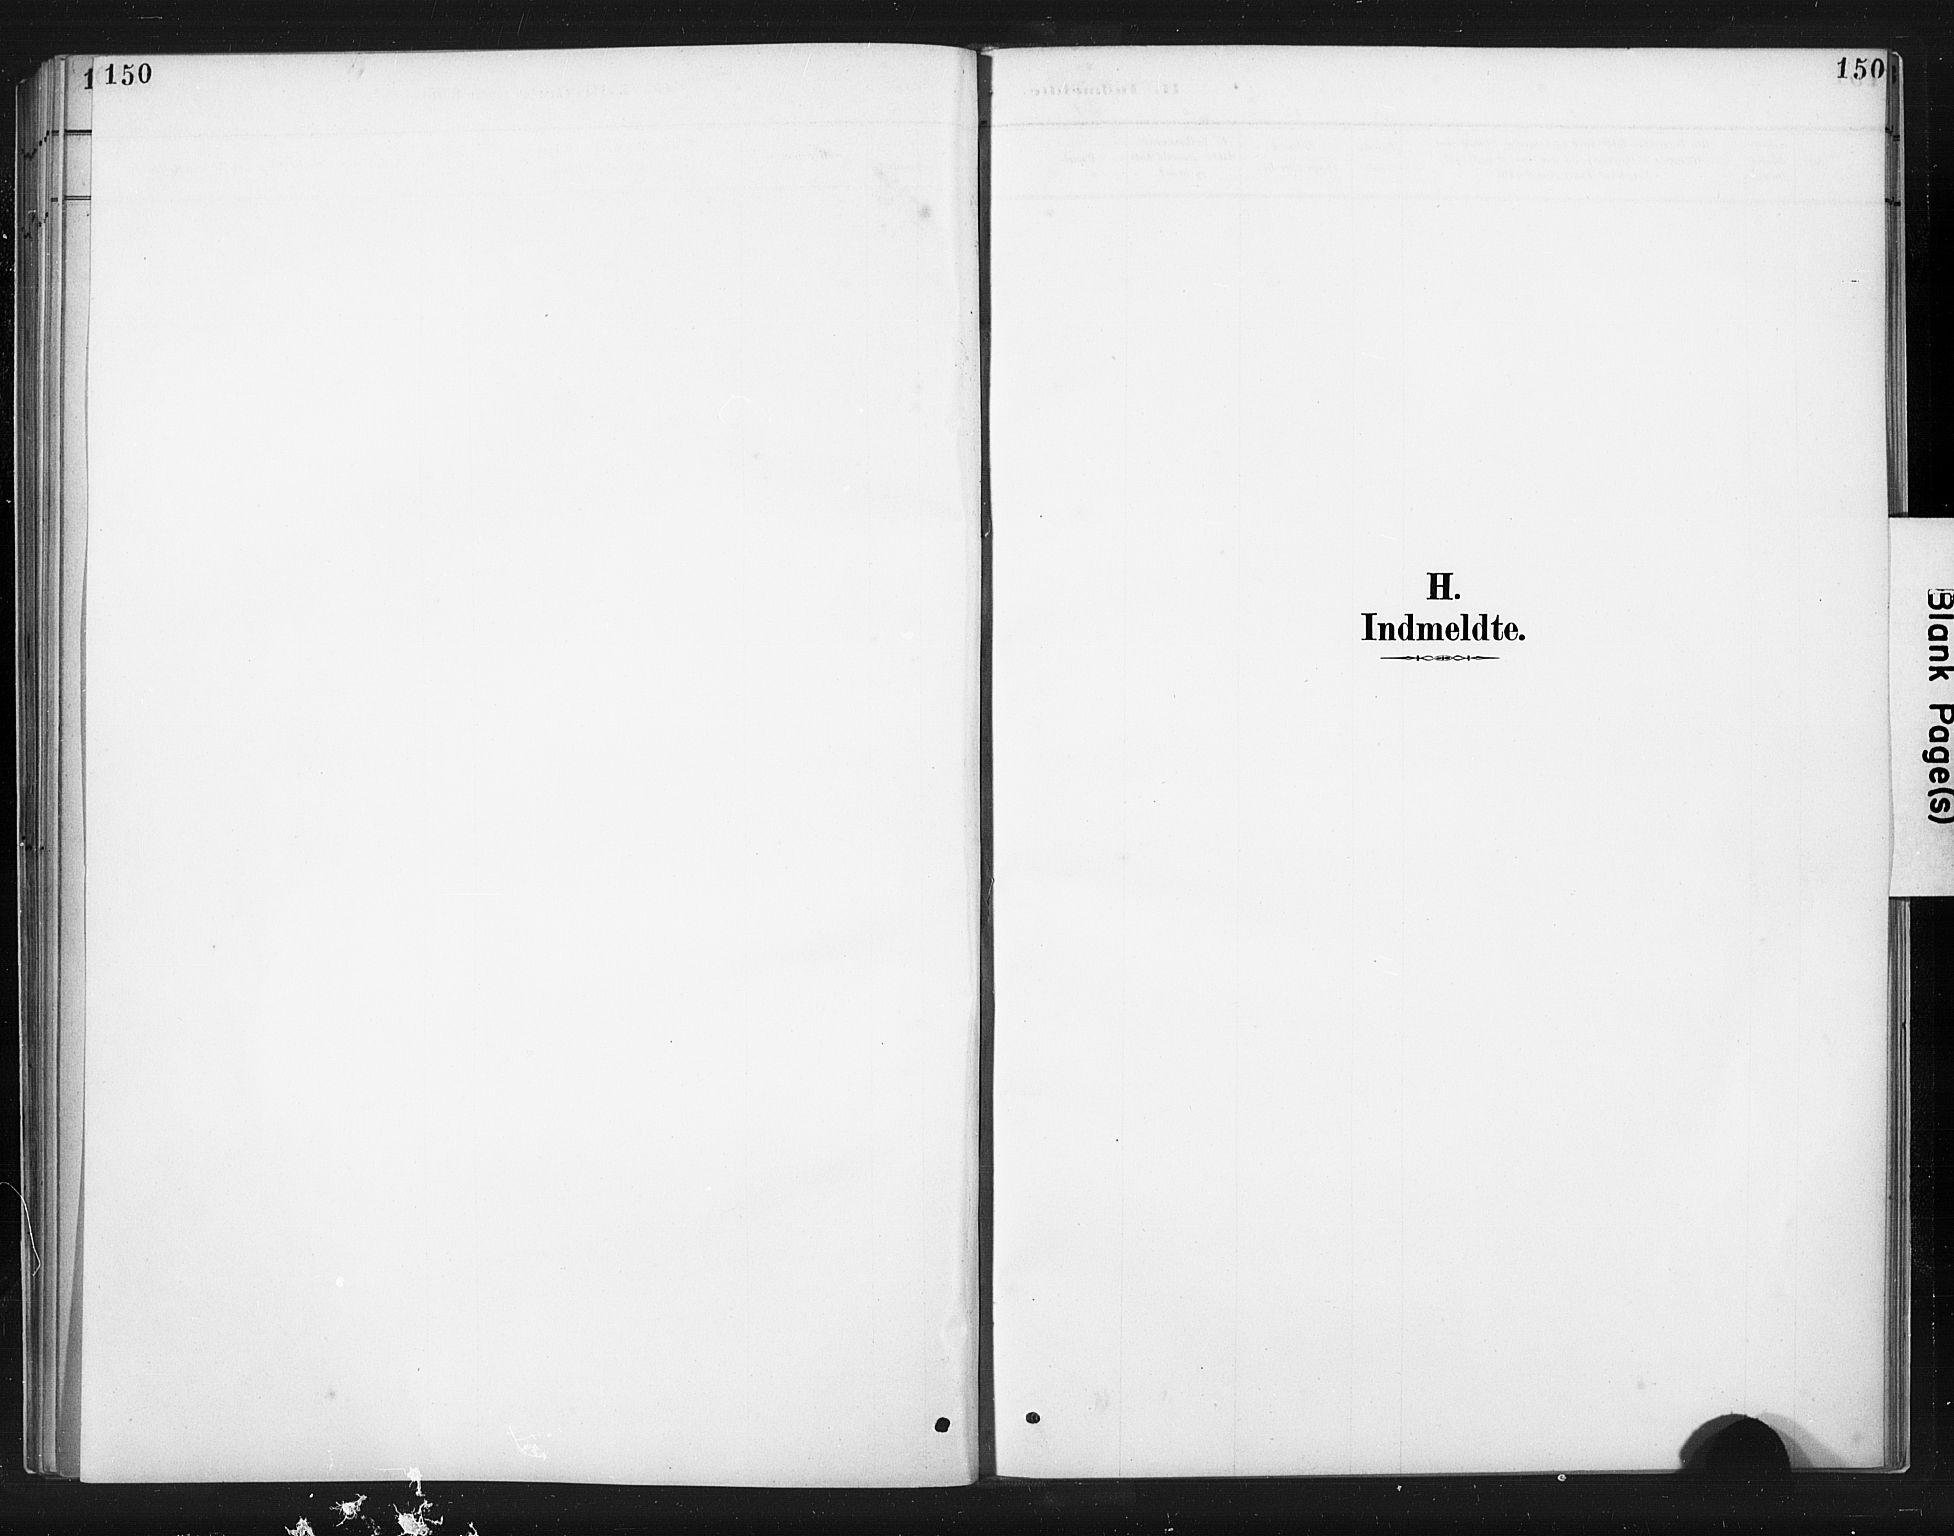 SAST, Torvastad sokneprestkontor, H/Ha/Haa/L0015: Ministerialbok nr. A 14, 1888-1899, s. 150